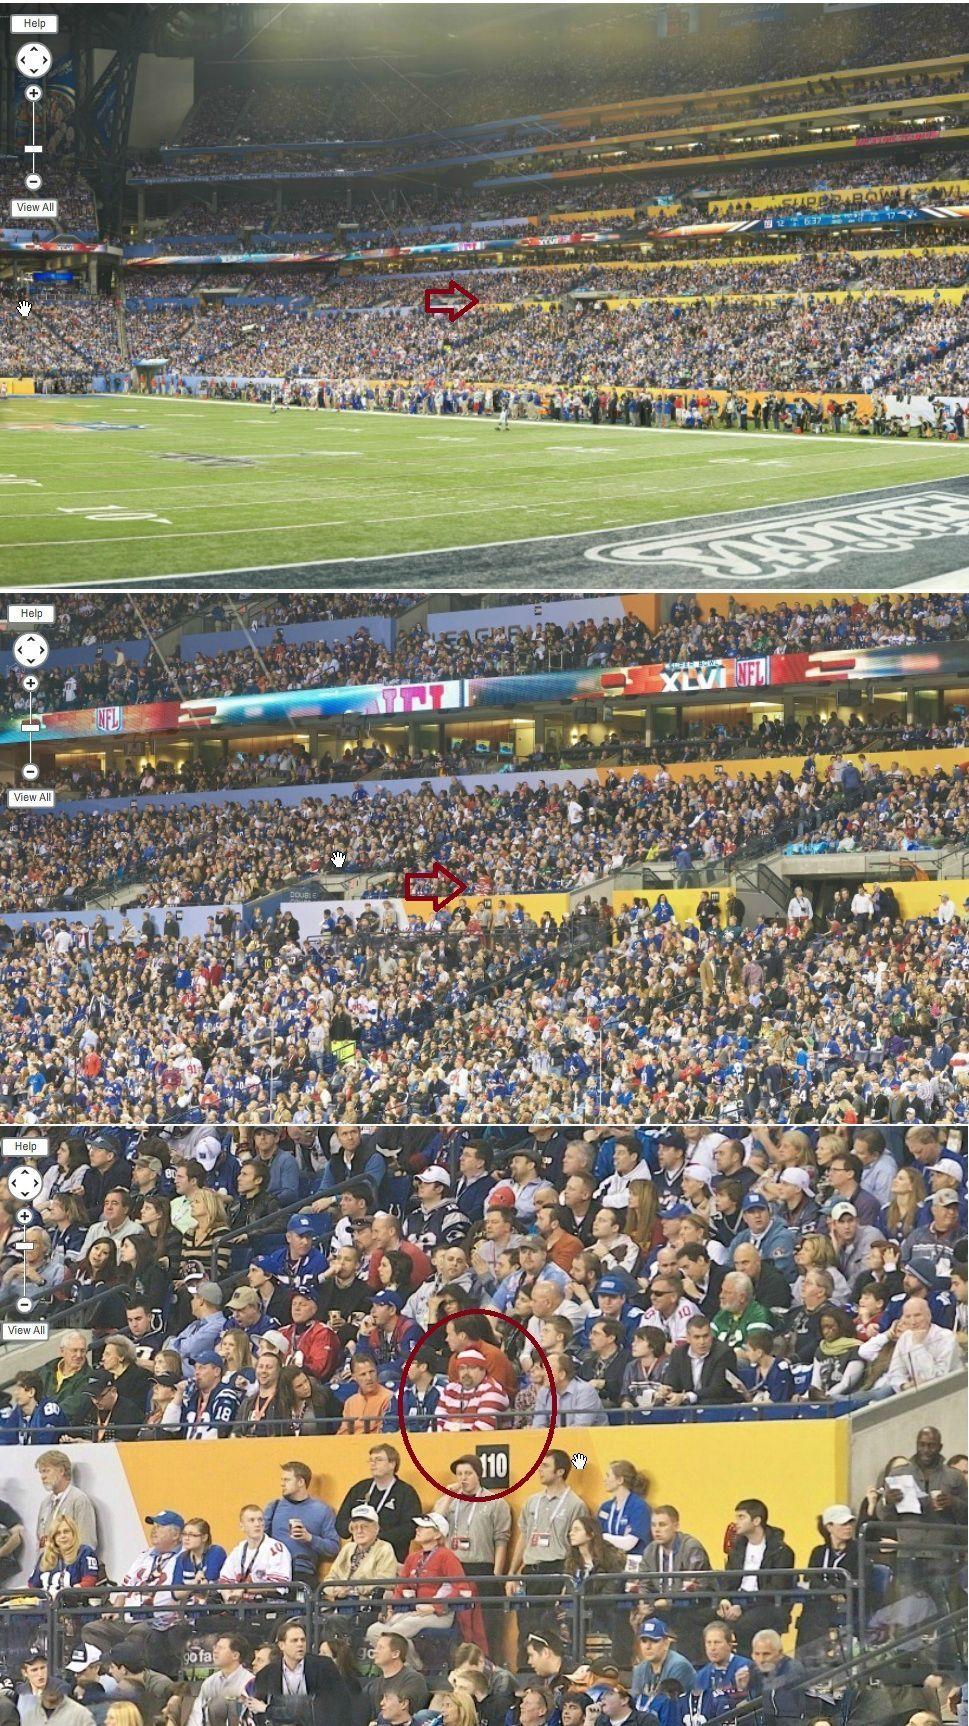 new york giants | SPORTS DEMOTIVATION |Funny Demotivational Posters Super Bowl Halftime